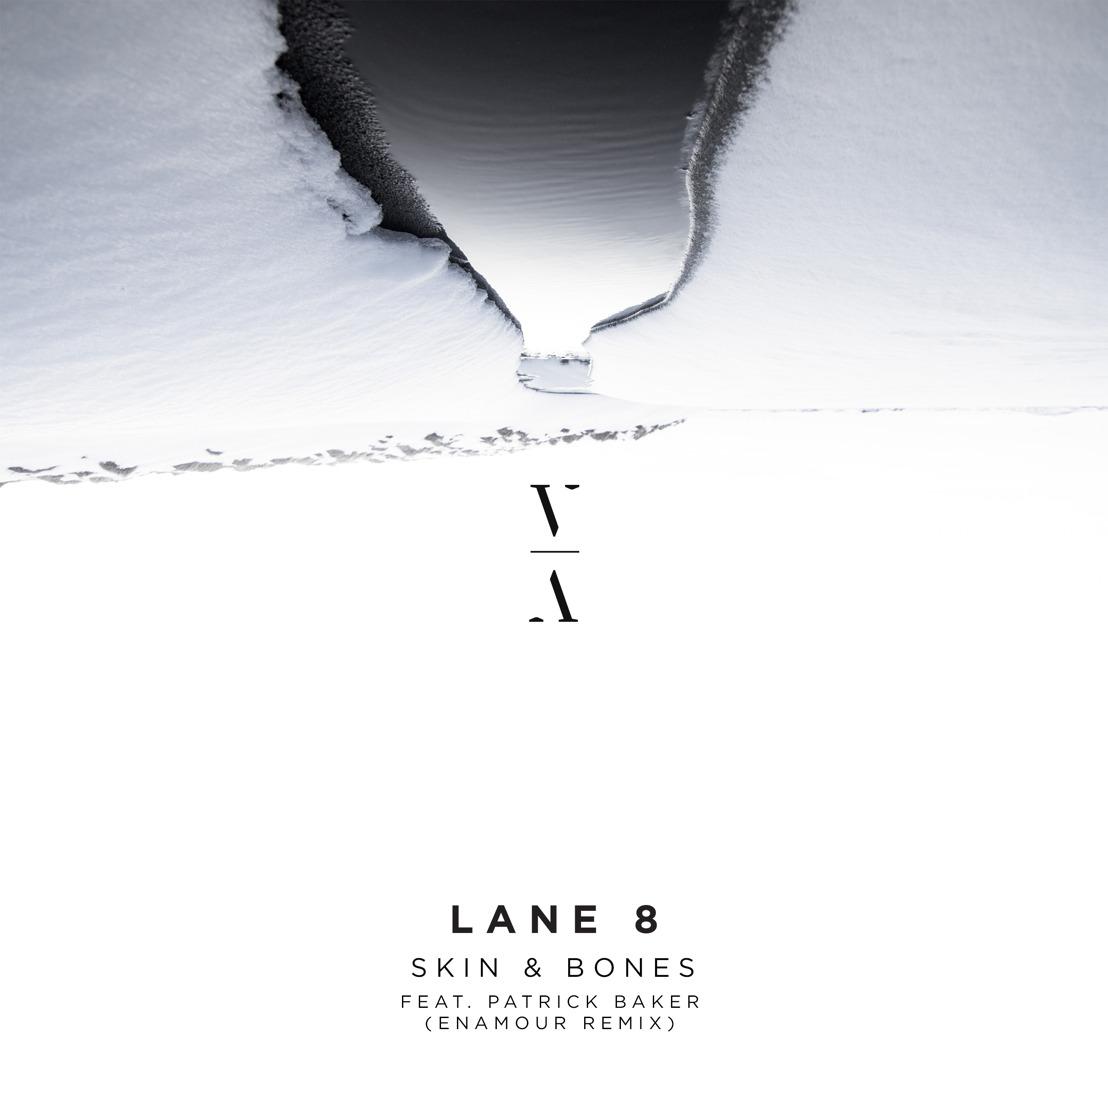 Lane 8's Releases 'Skin & Bones' ft. Patrick Baker (Enamour Remix)